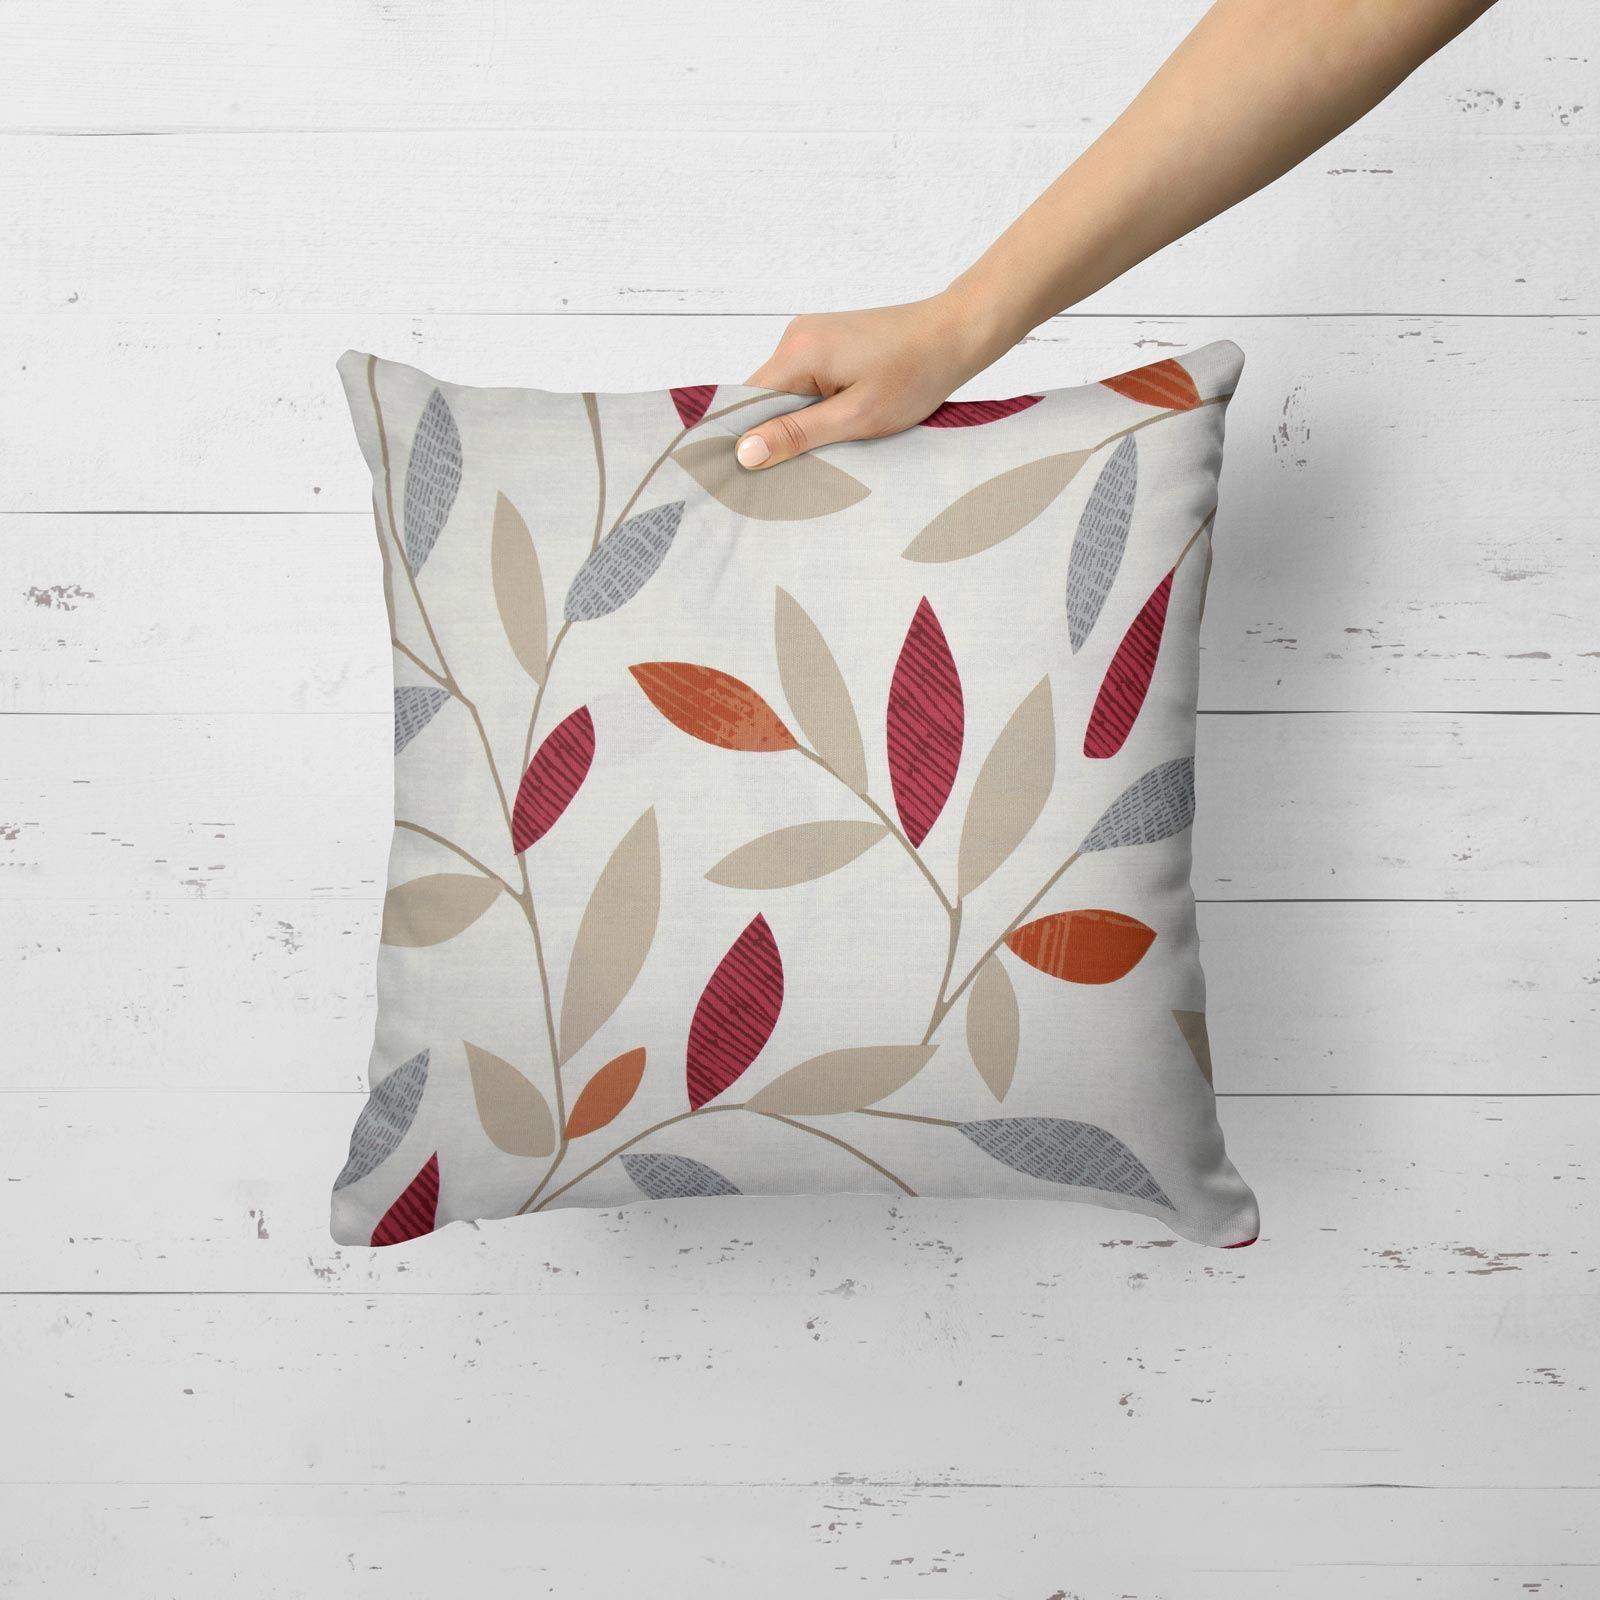 Vino-Tinto-Cushion-Covers-Coleccion-17-034-18-034-43cm-45cm-Cubierta miniatura 47